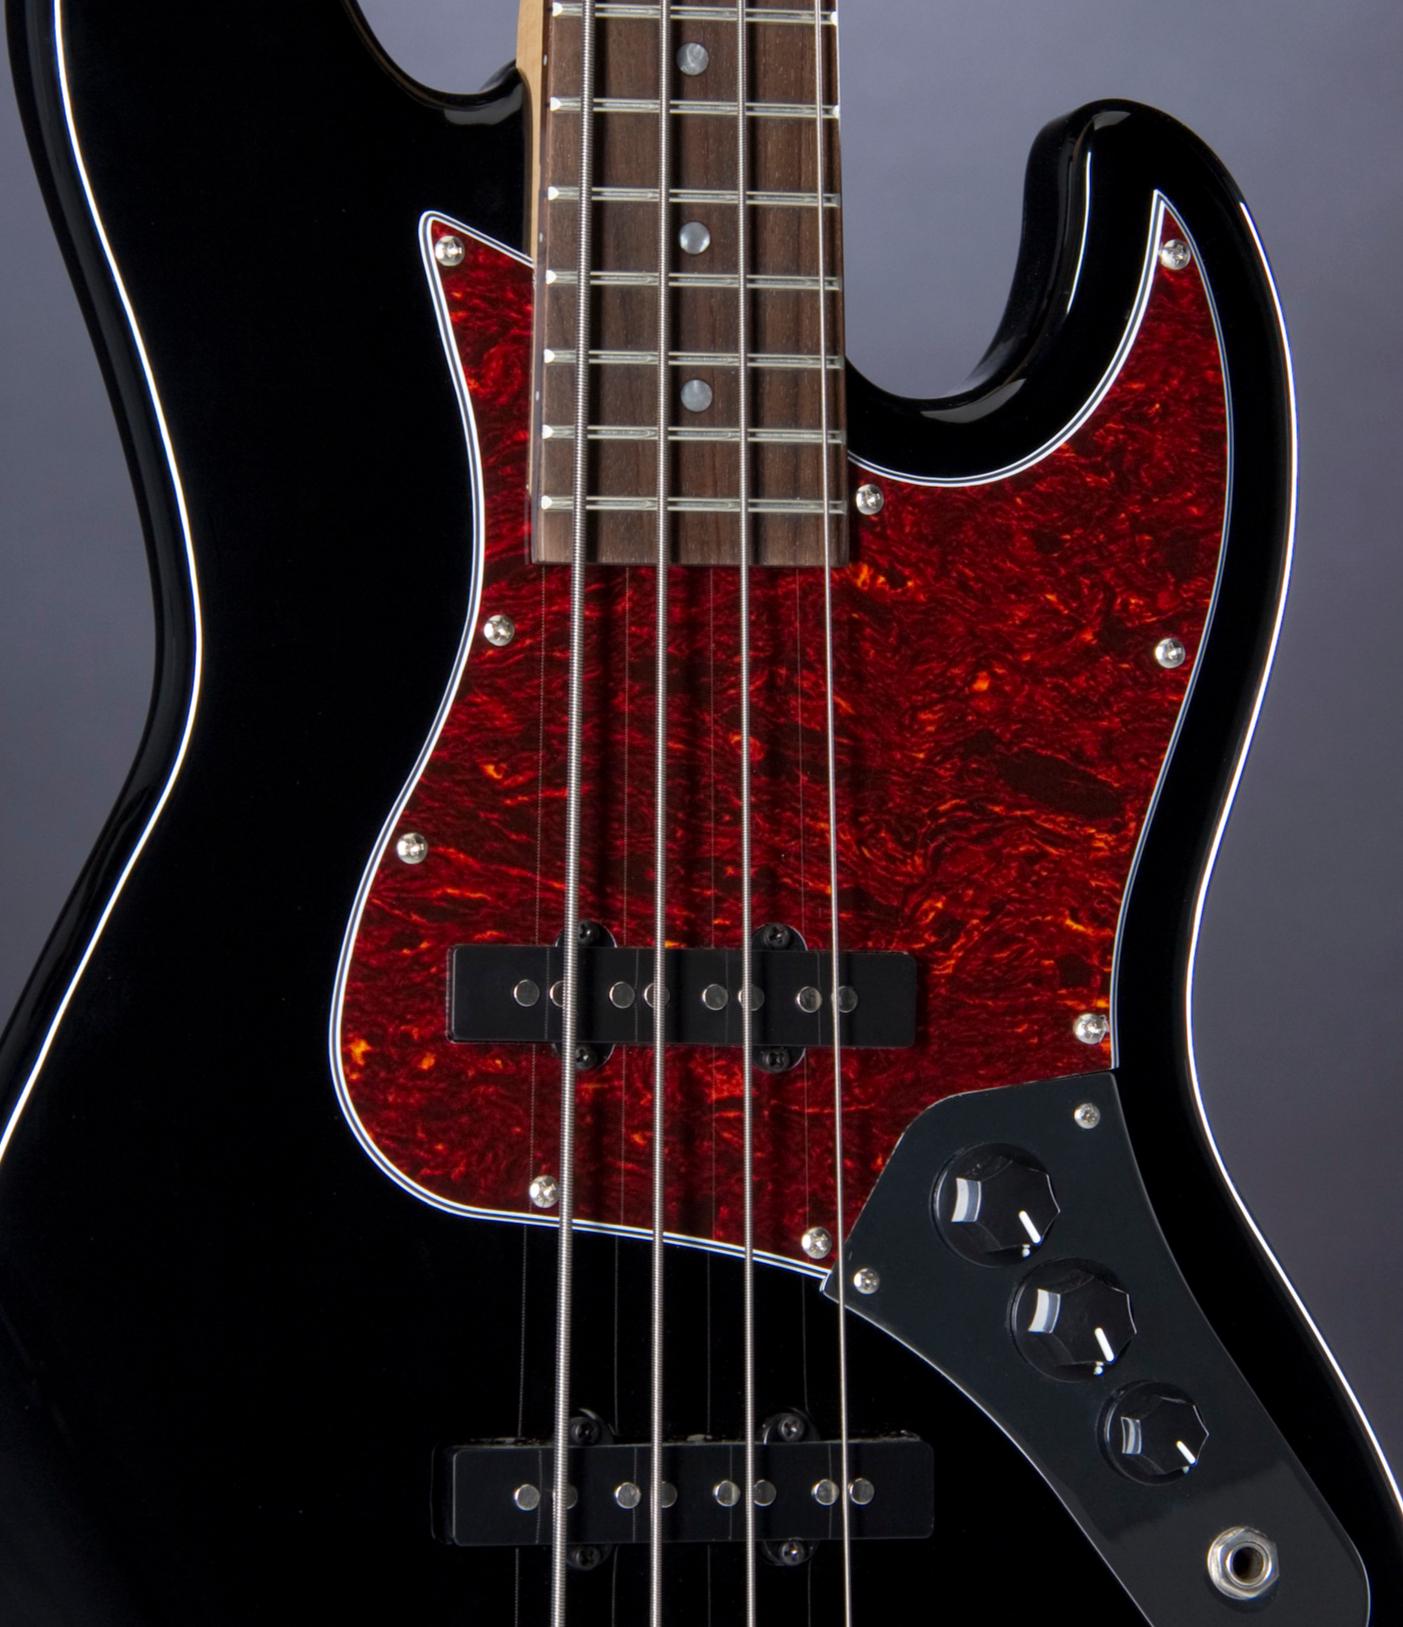 j d bass guitar jb mini bk black dv247 en gb. Black Bedroom Furniture Sets. Home Design Ideas